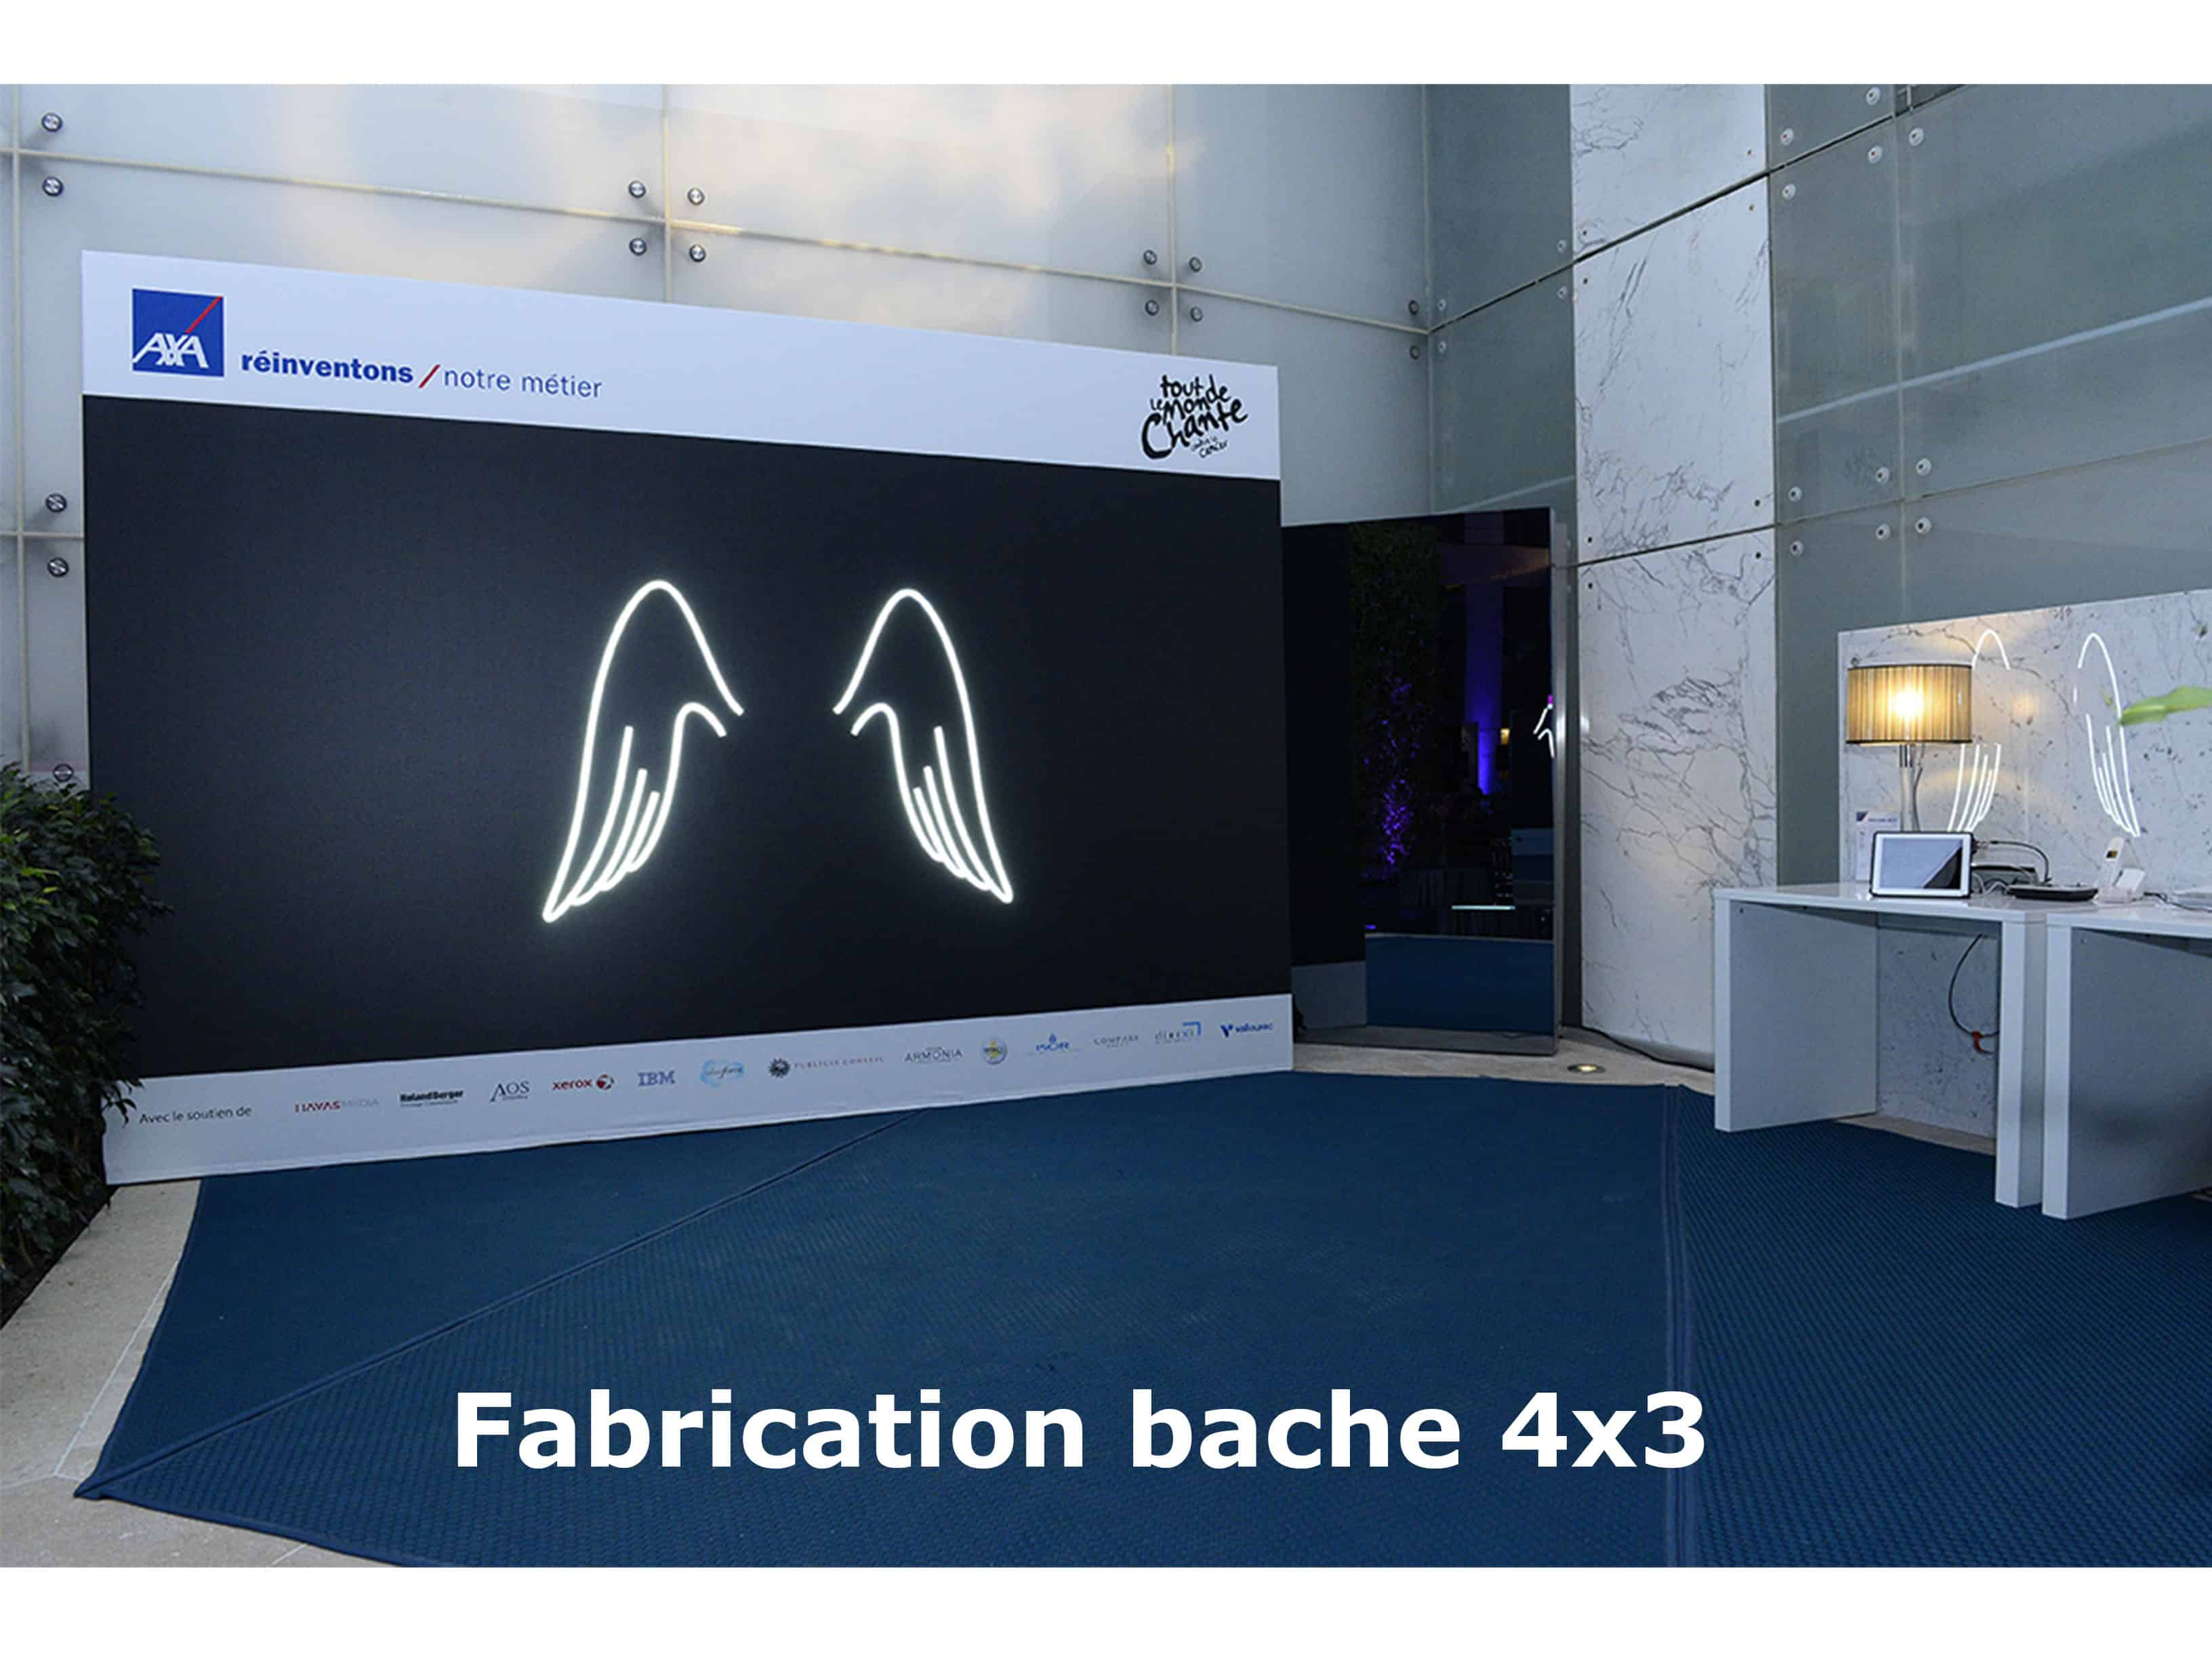 fabrication de bache photobooth 3 - Photobooth et vidéobooth Paris, Location photomaton